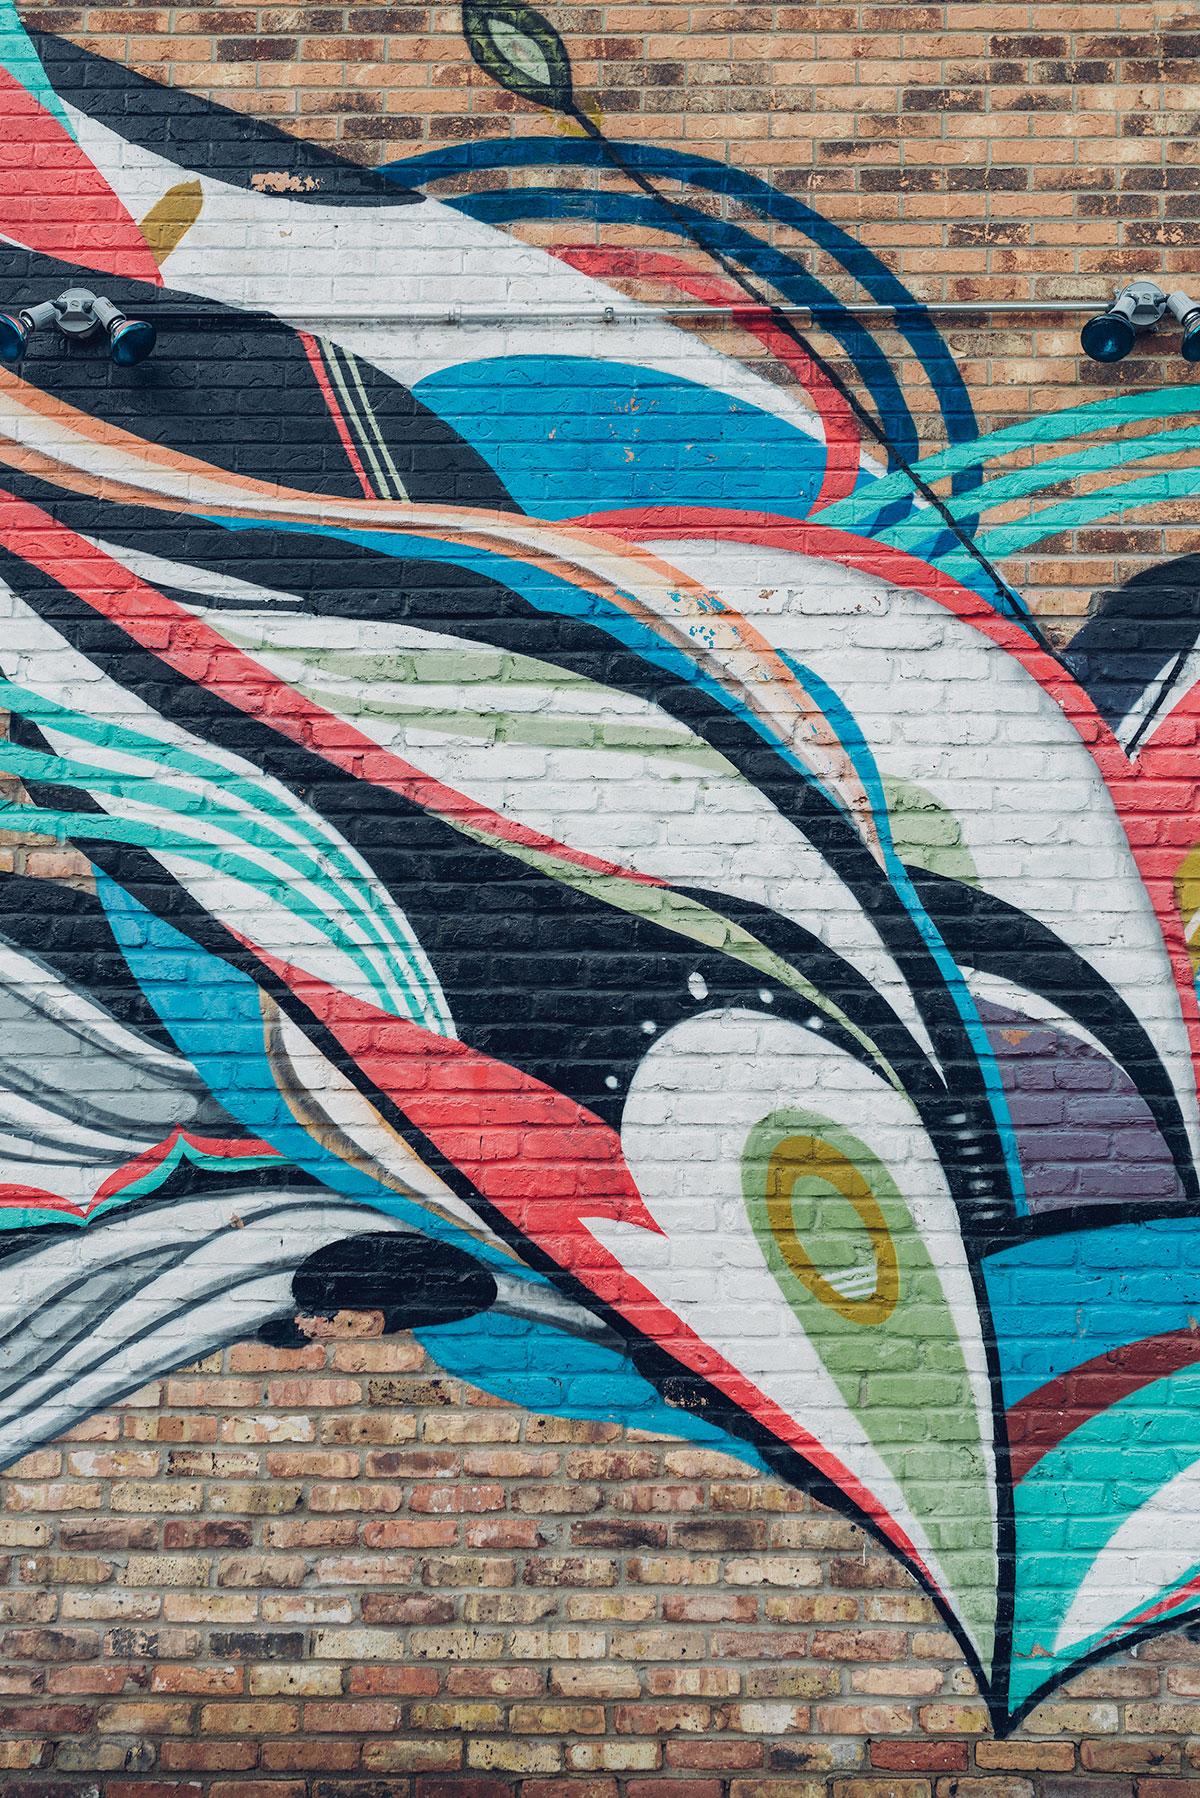 Bright Pilsen mural art